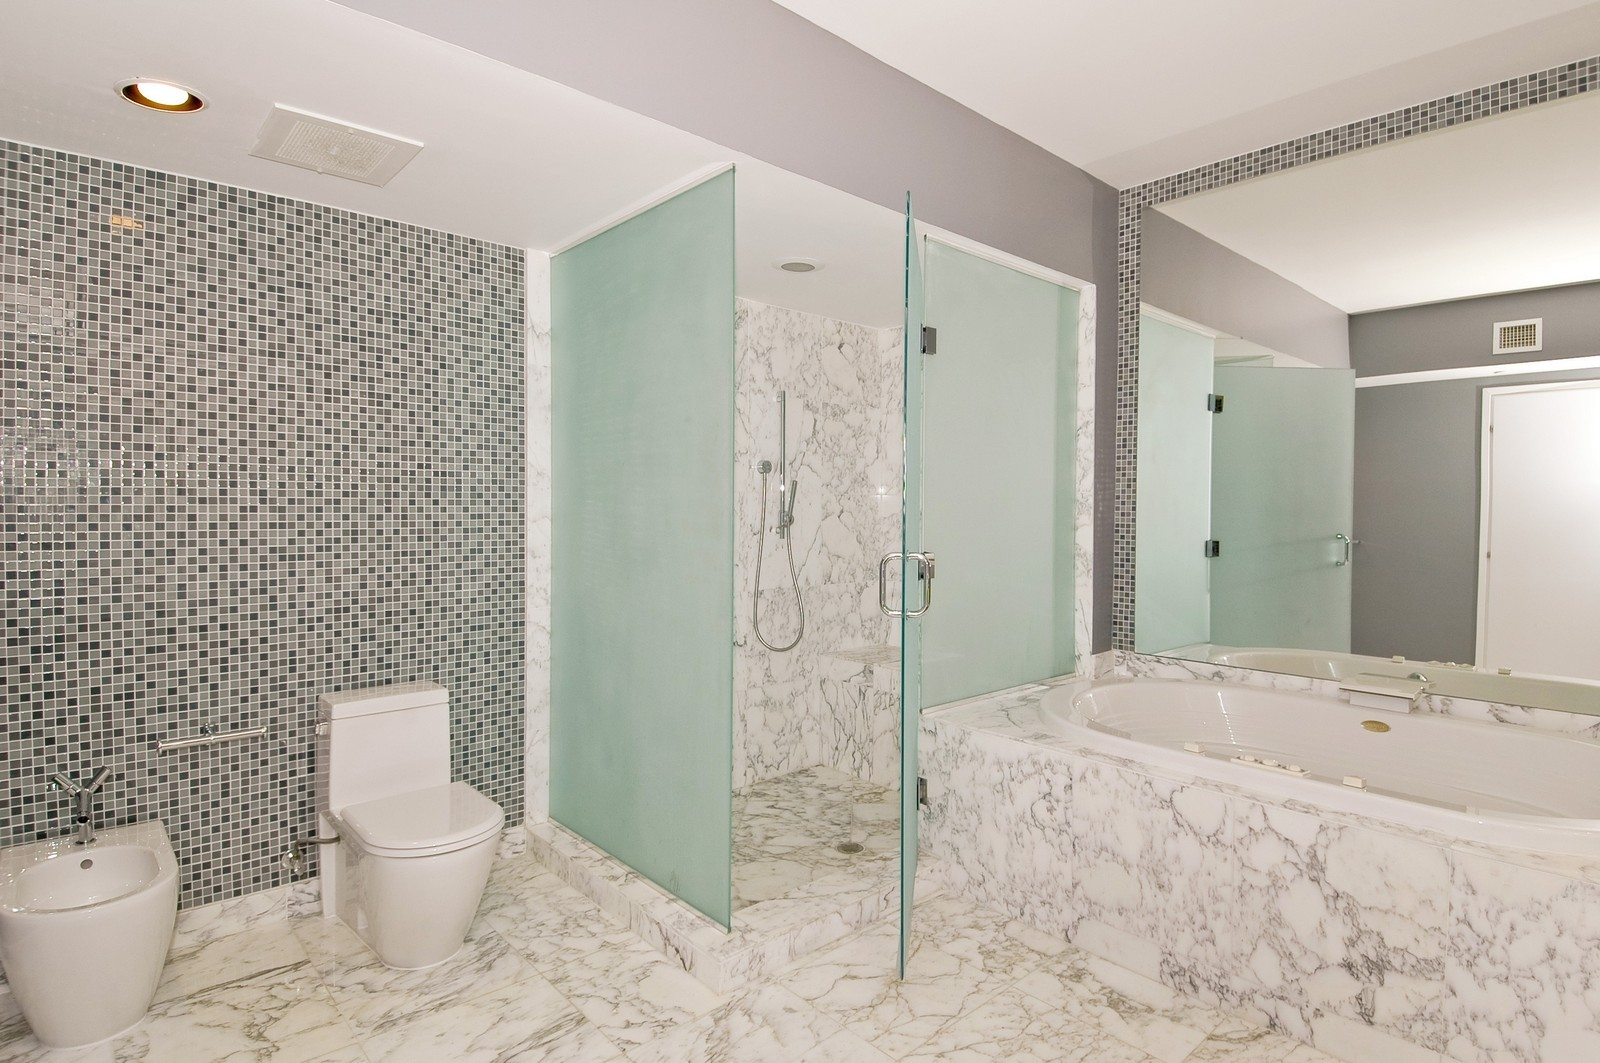 Real Estate Photography - 450 Alton Rd, Unit 2910, Miami Beach, FL, 33139 - Master Bathroom